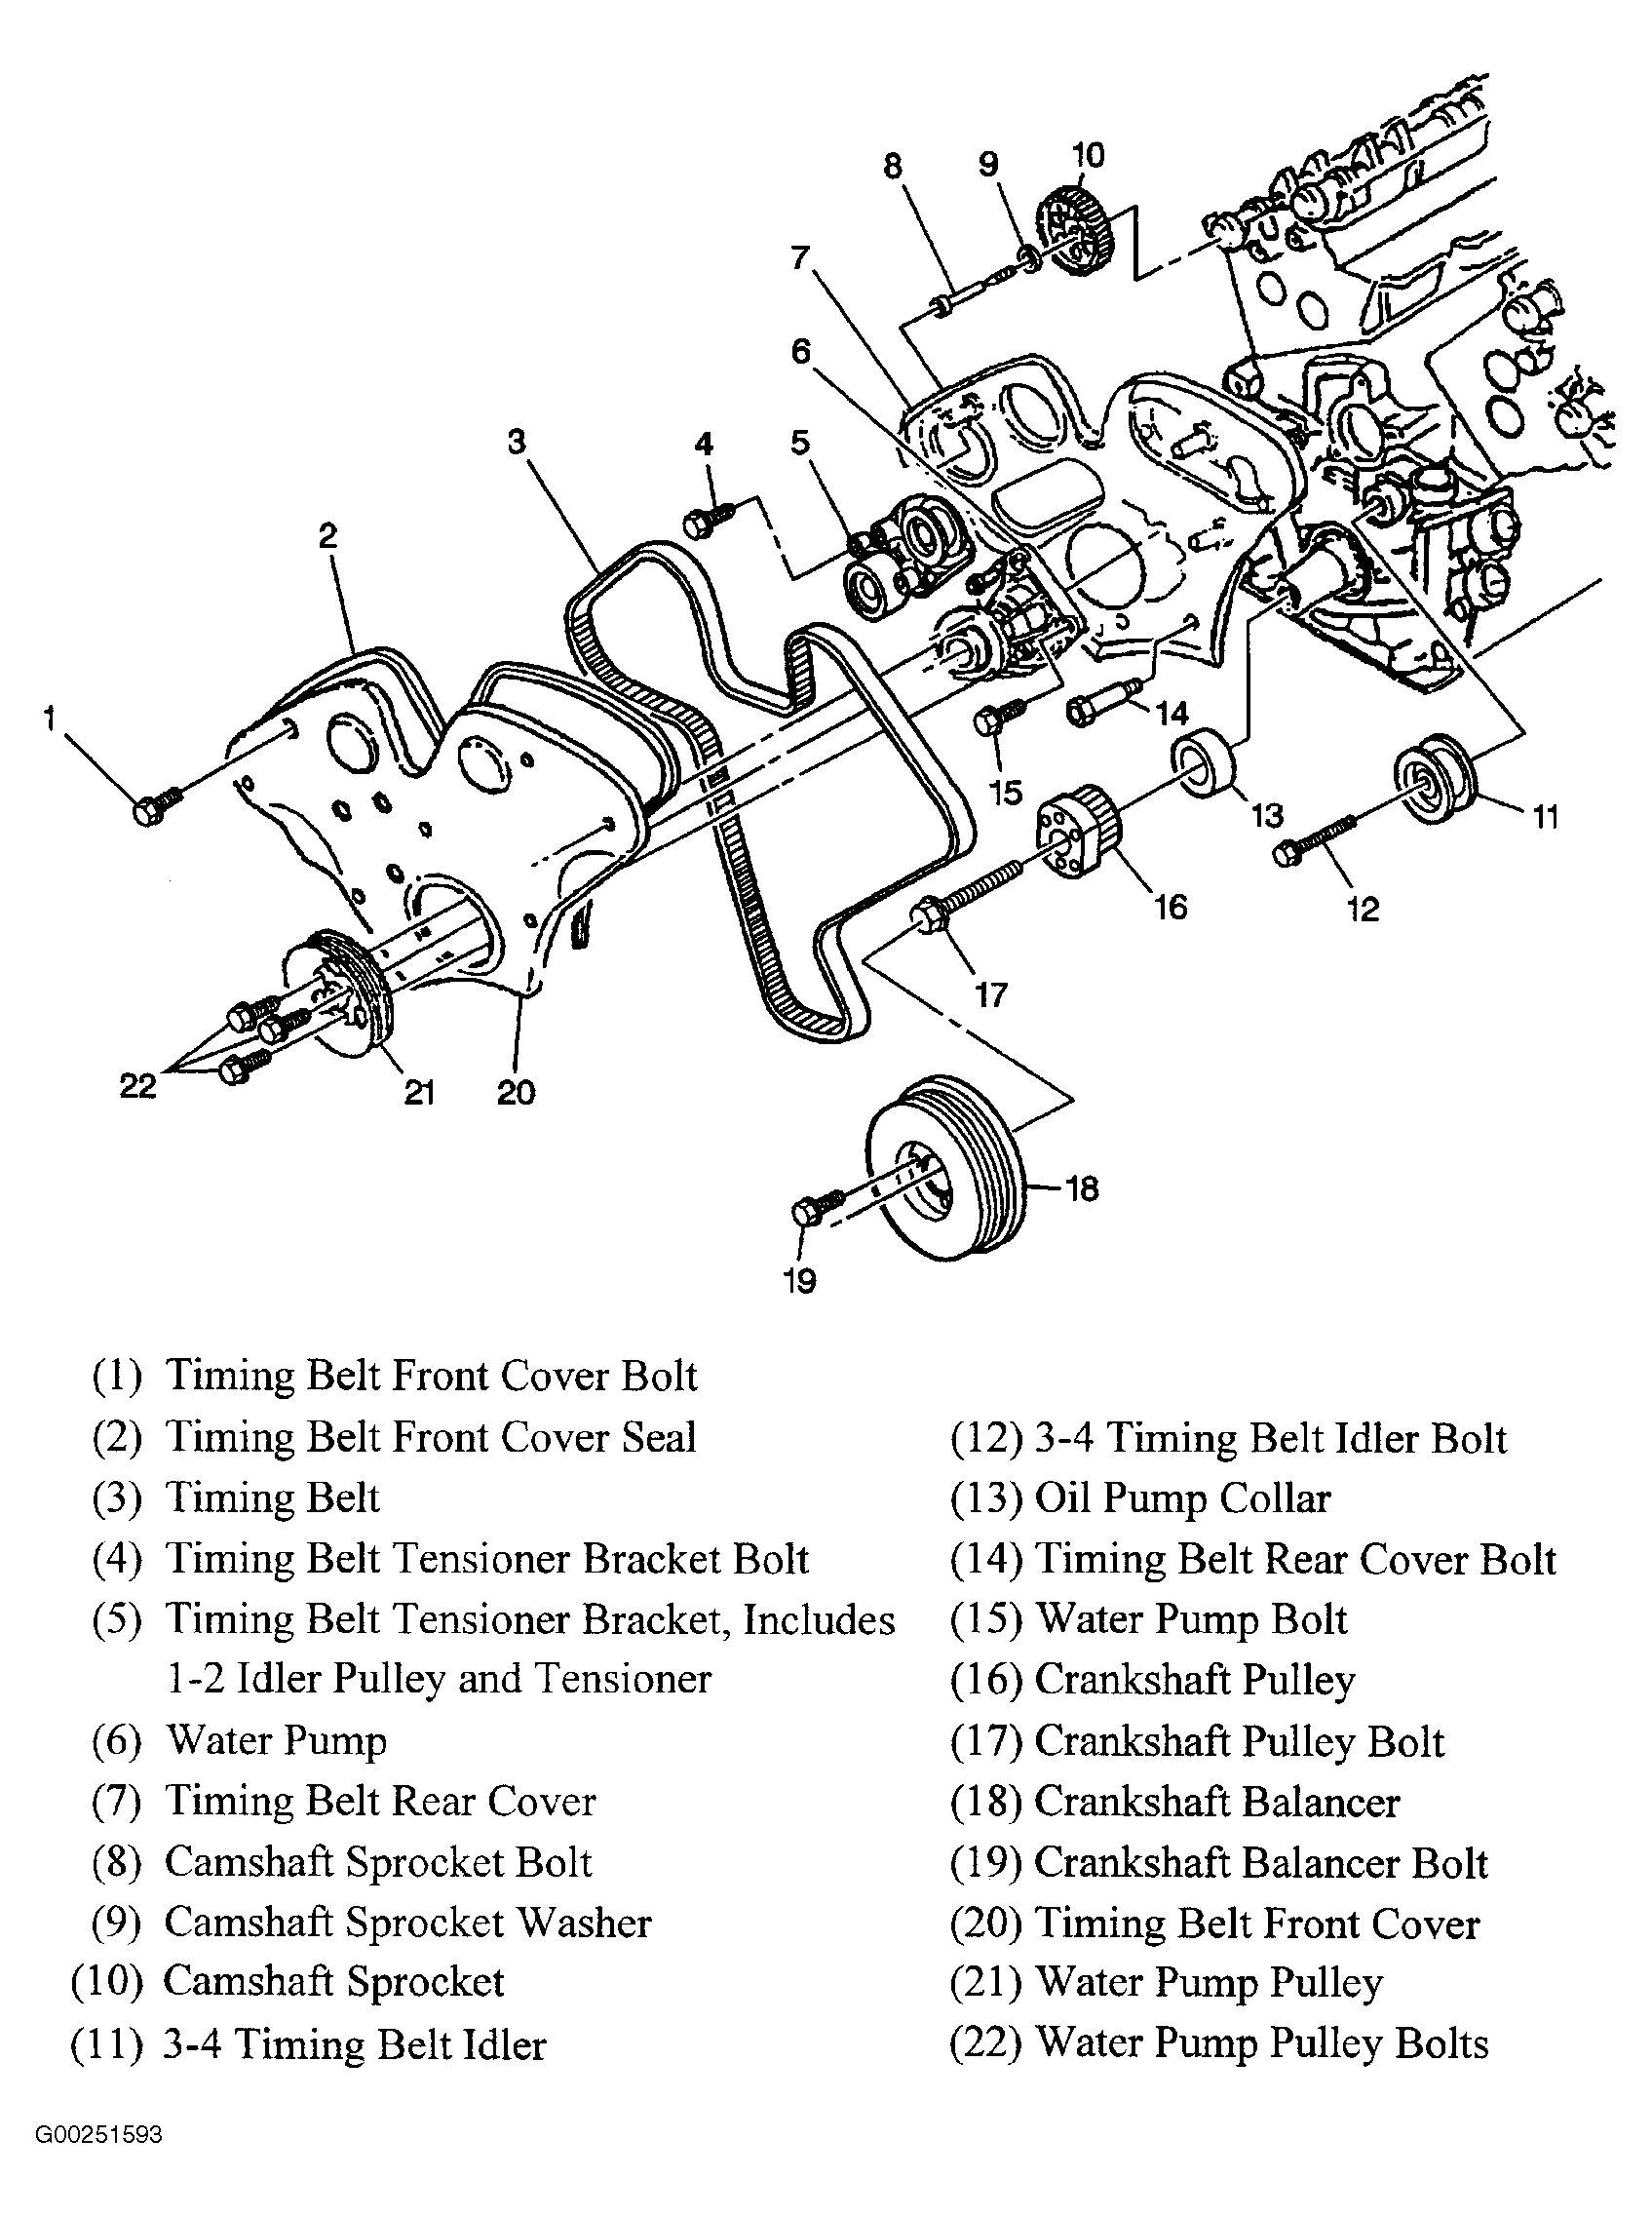 7 3 Engine Parts Diagram Hyundai Body Parts Diagram Of 7 3 Engine Parts Diagram